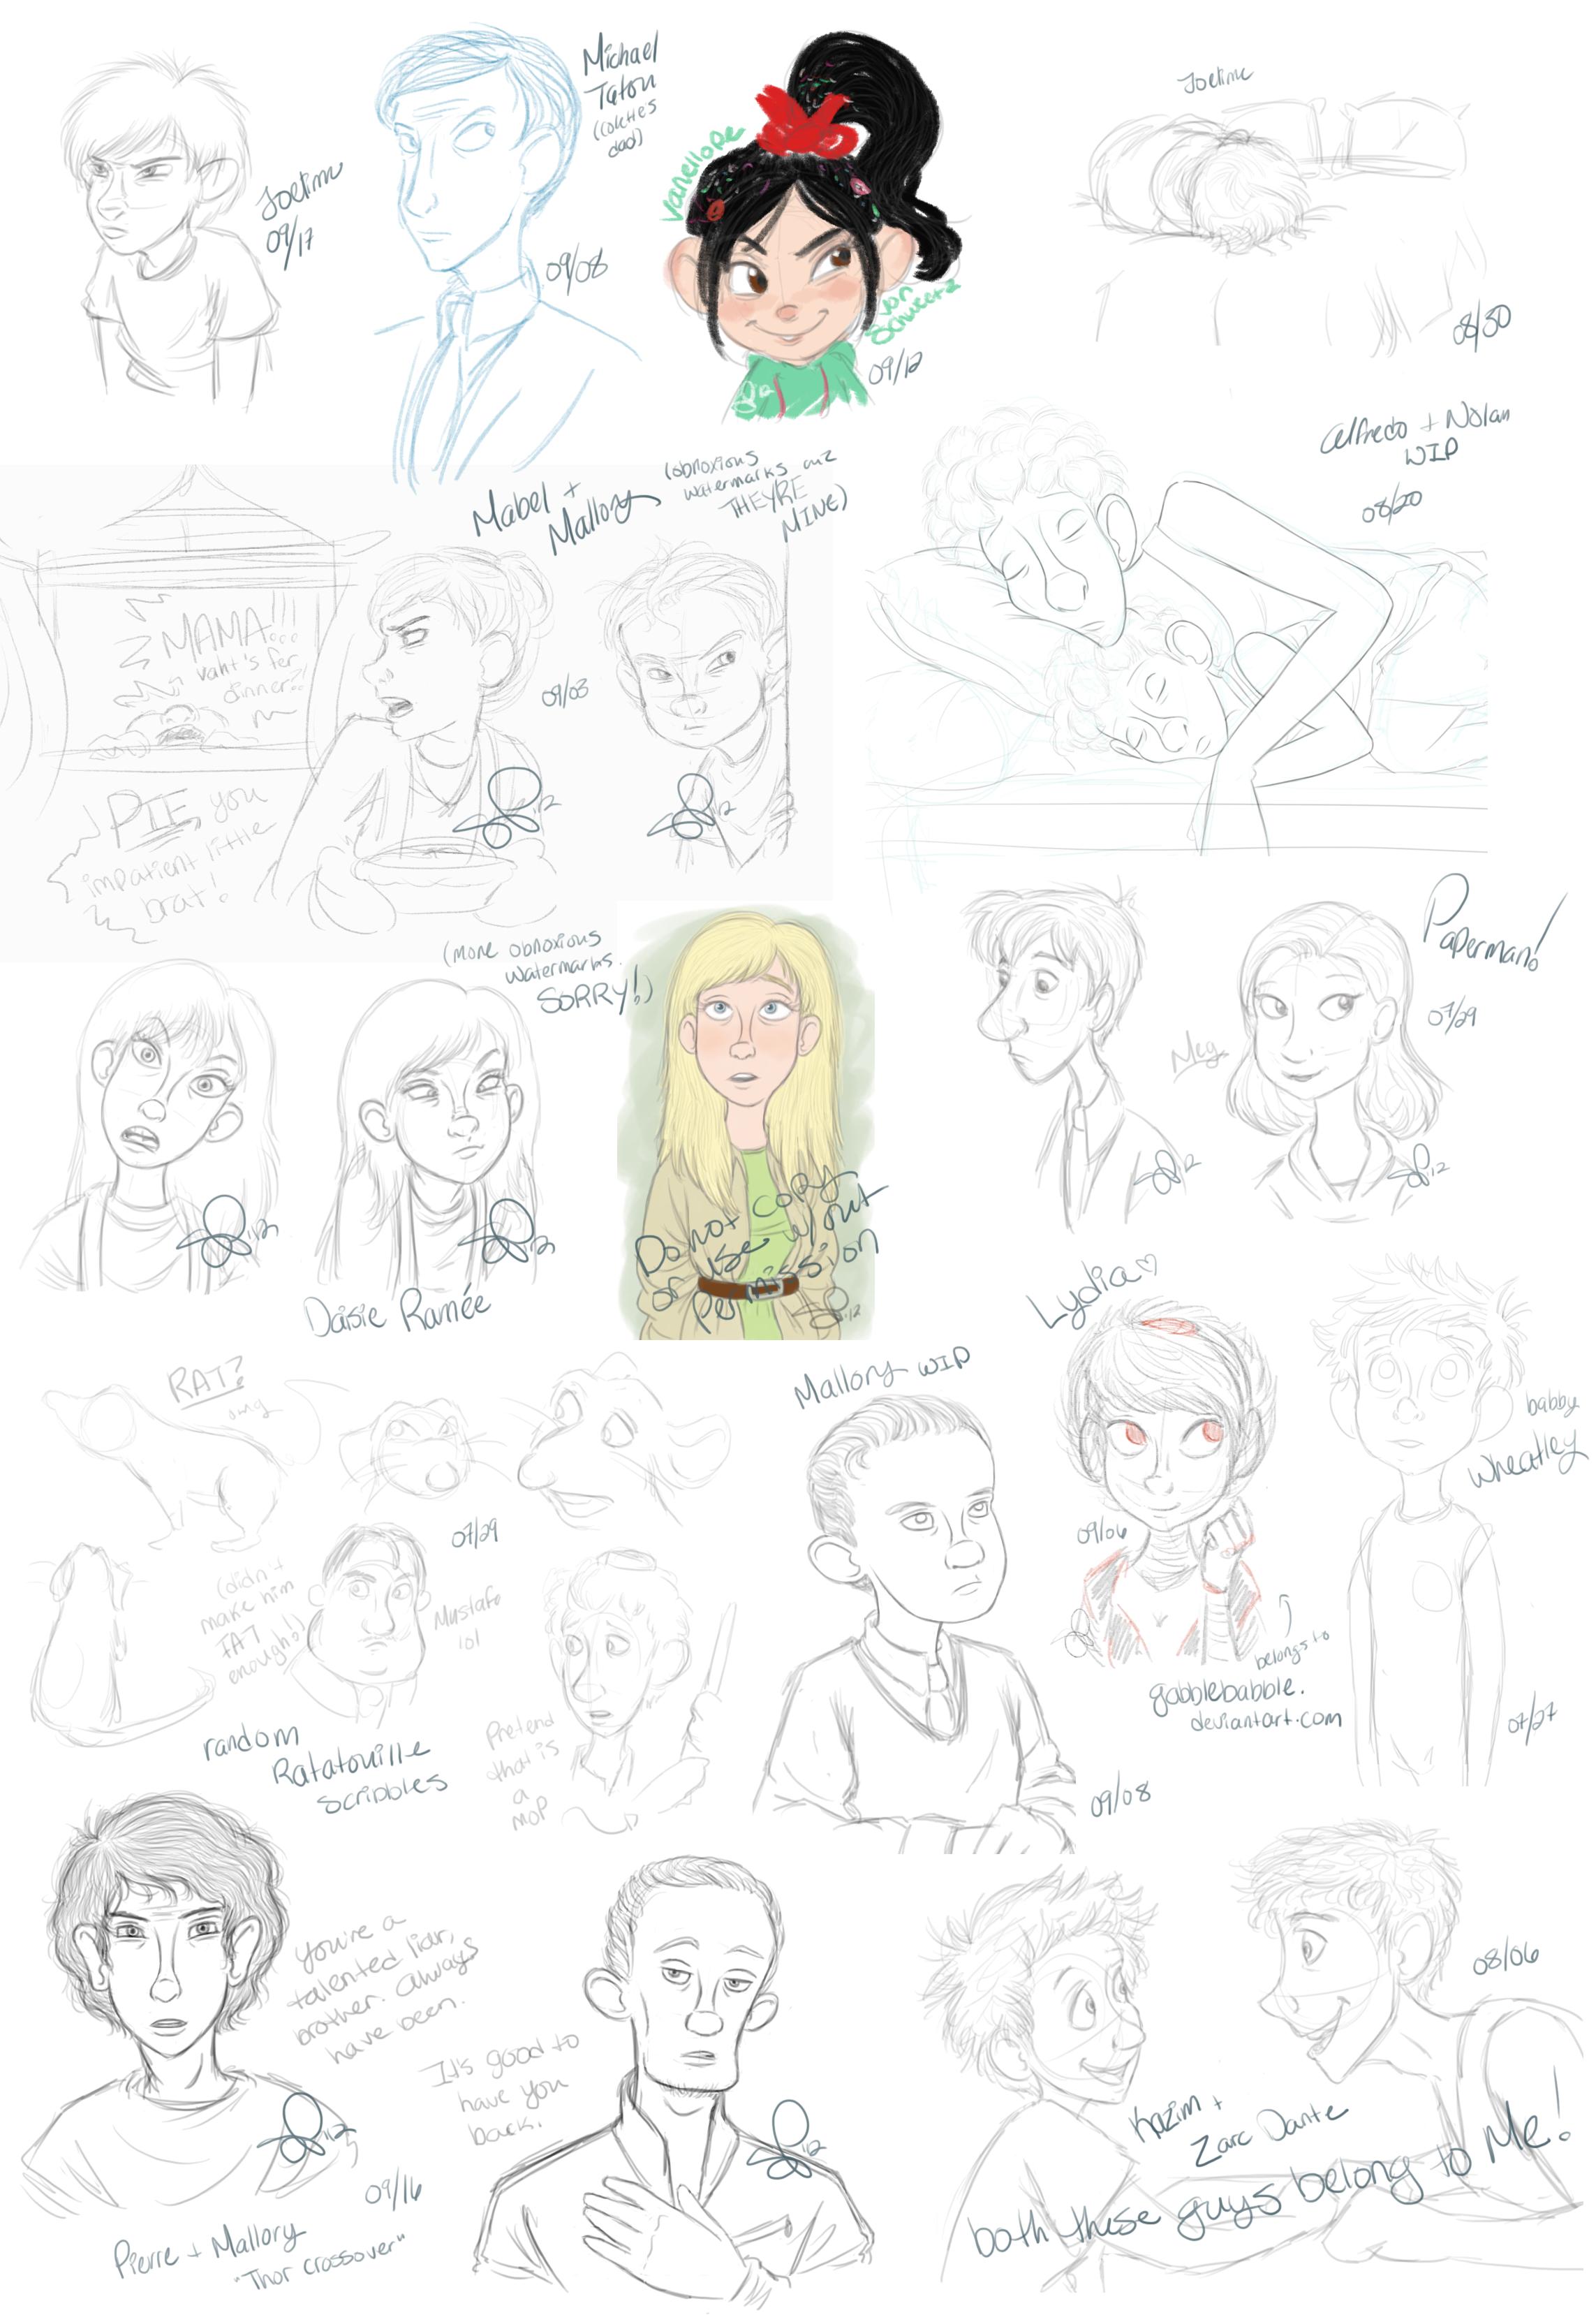 sketch dump 092412